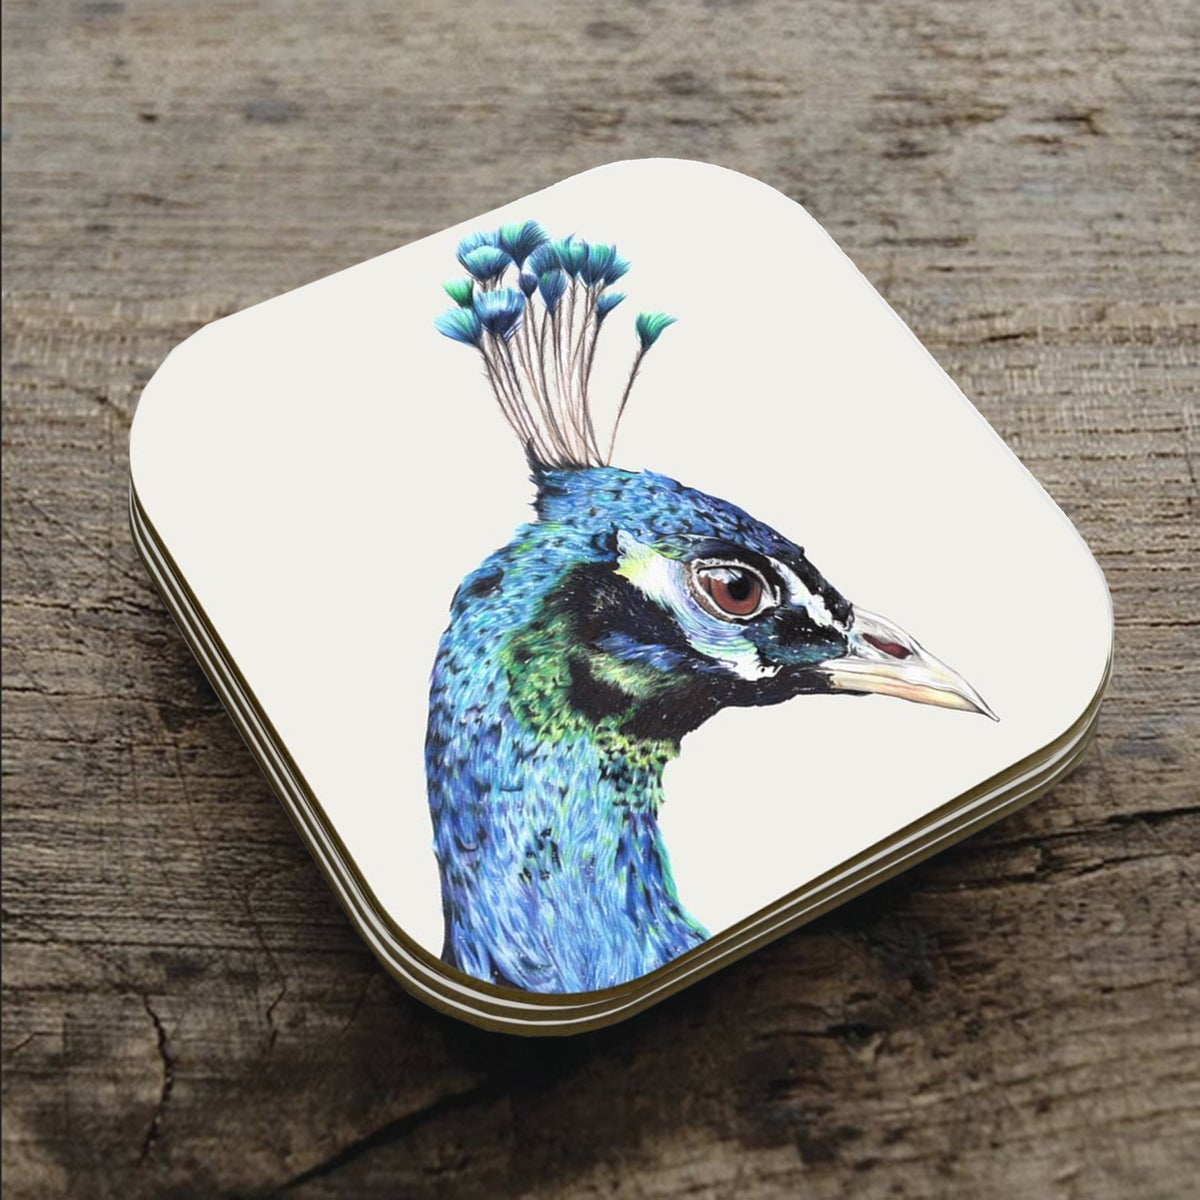 Image of 'Peacock' Coaster